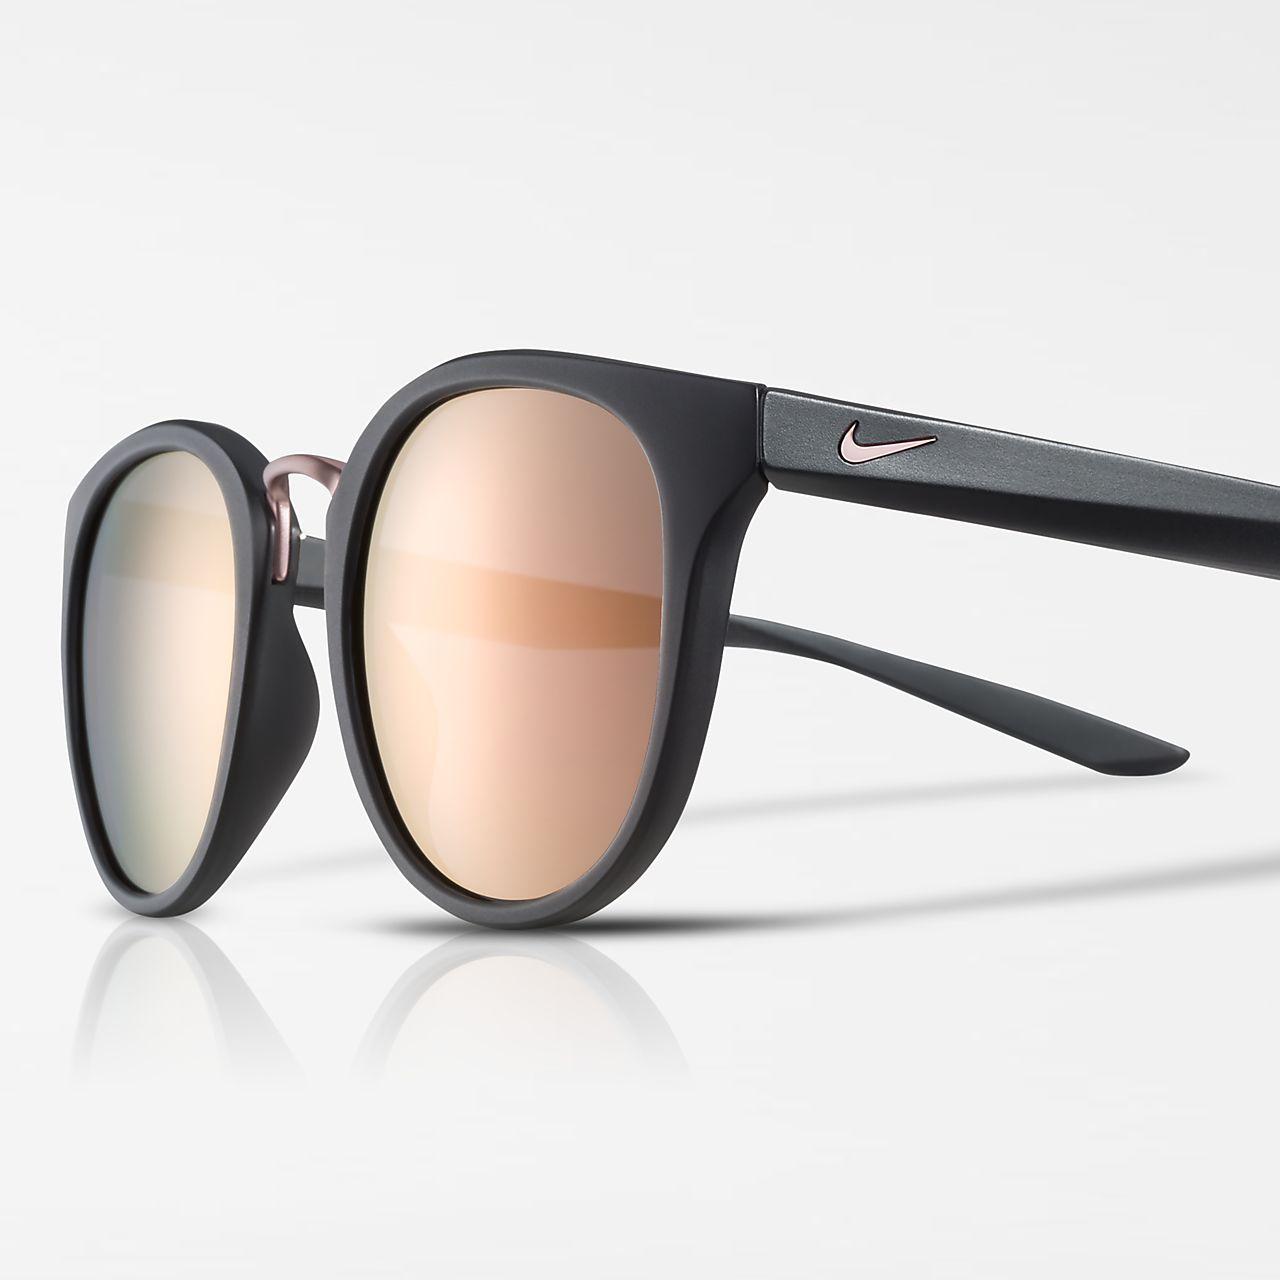 Nike Revere Mirrored Sunglasses